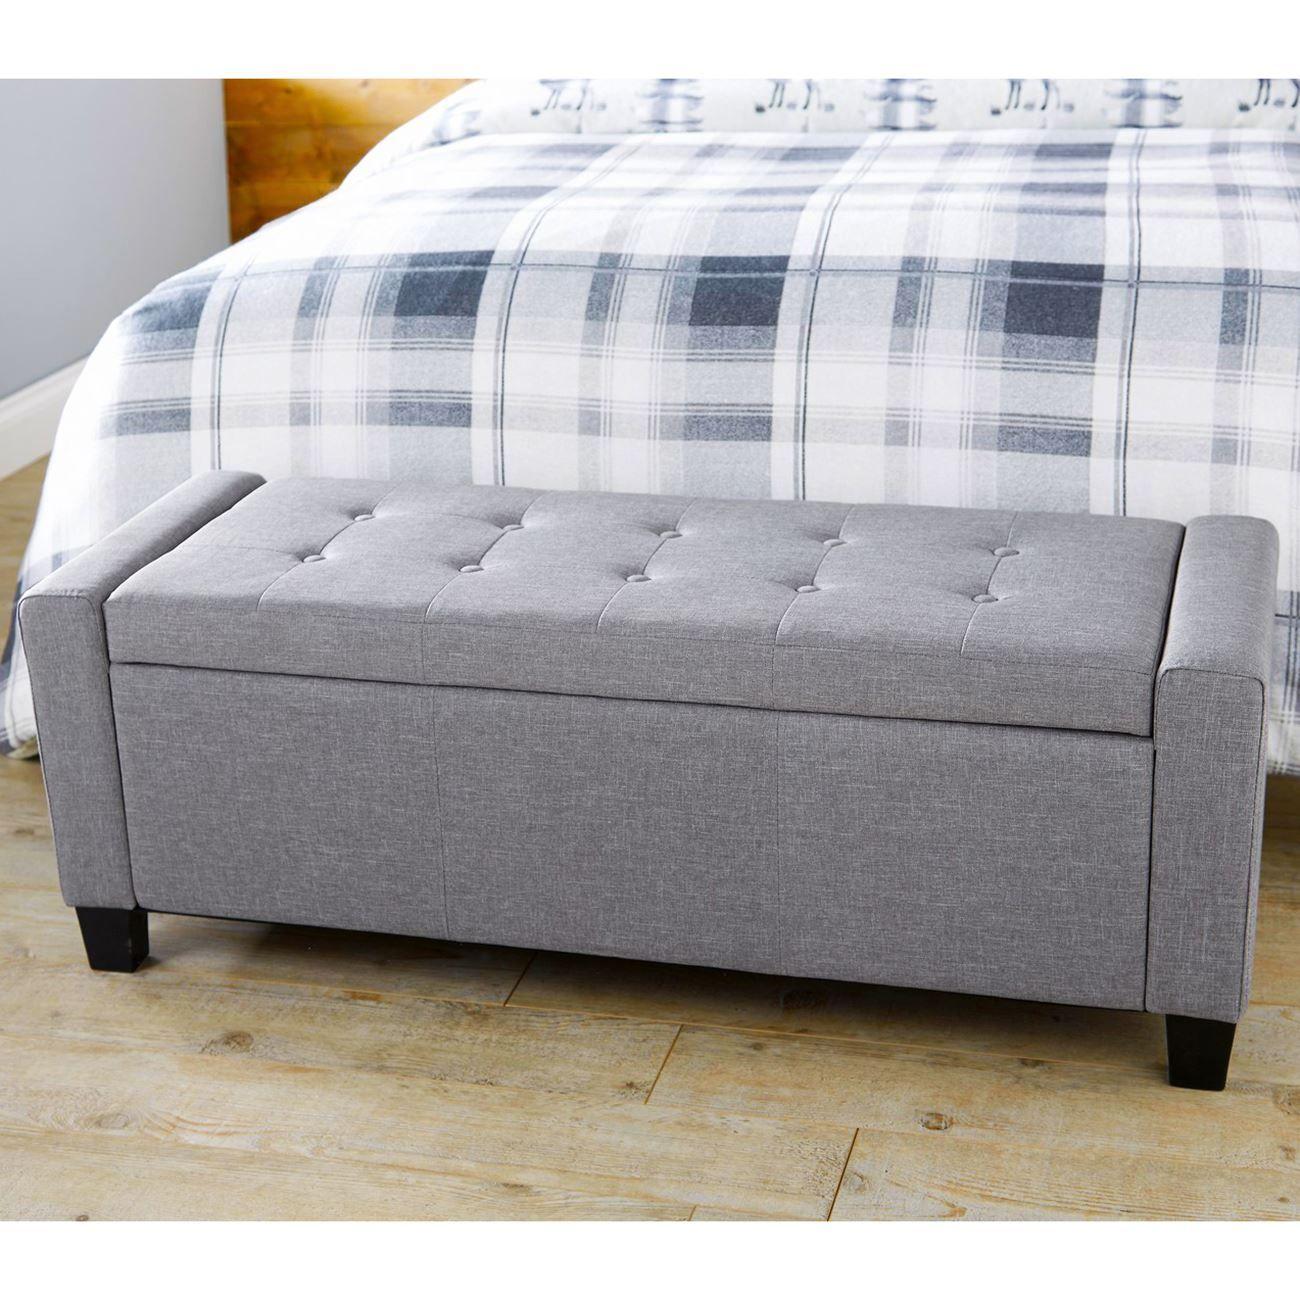 bedroom ottoman bench australia | design ideas 2017-2018 ...